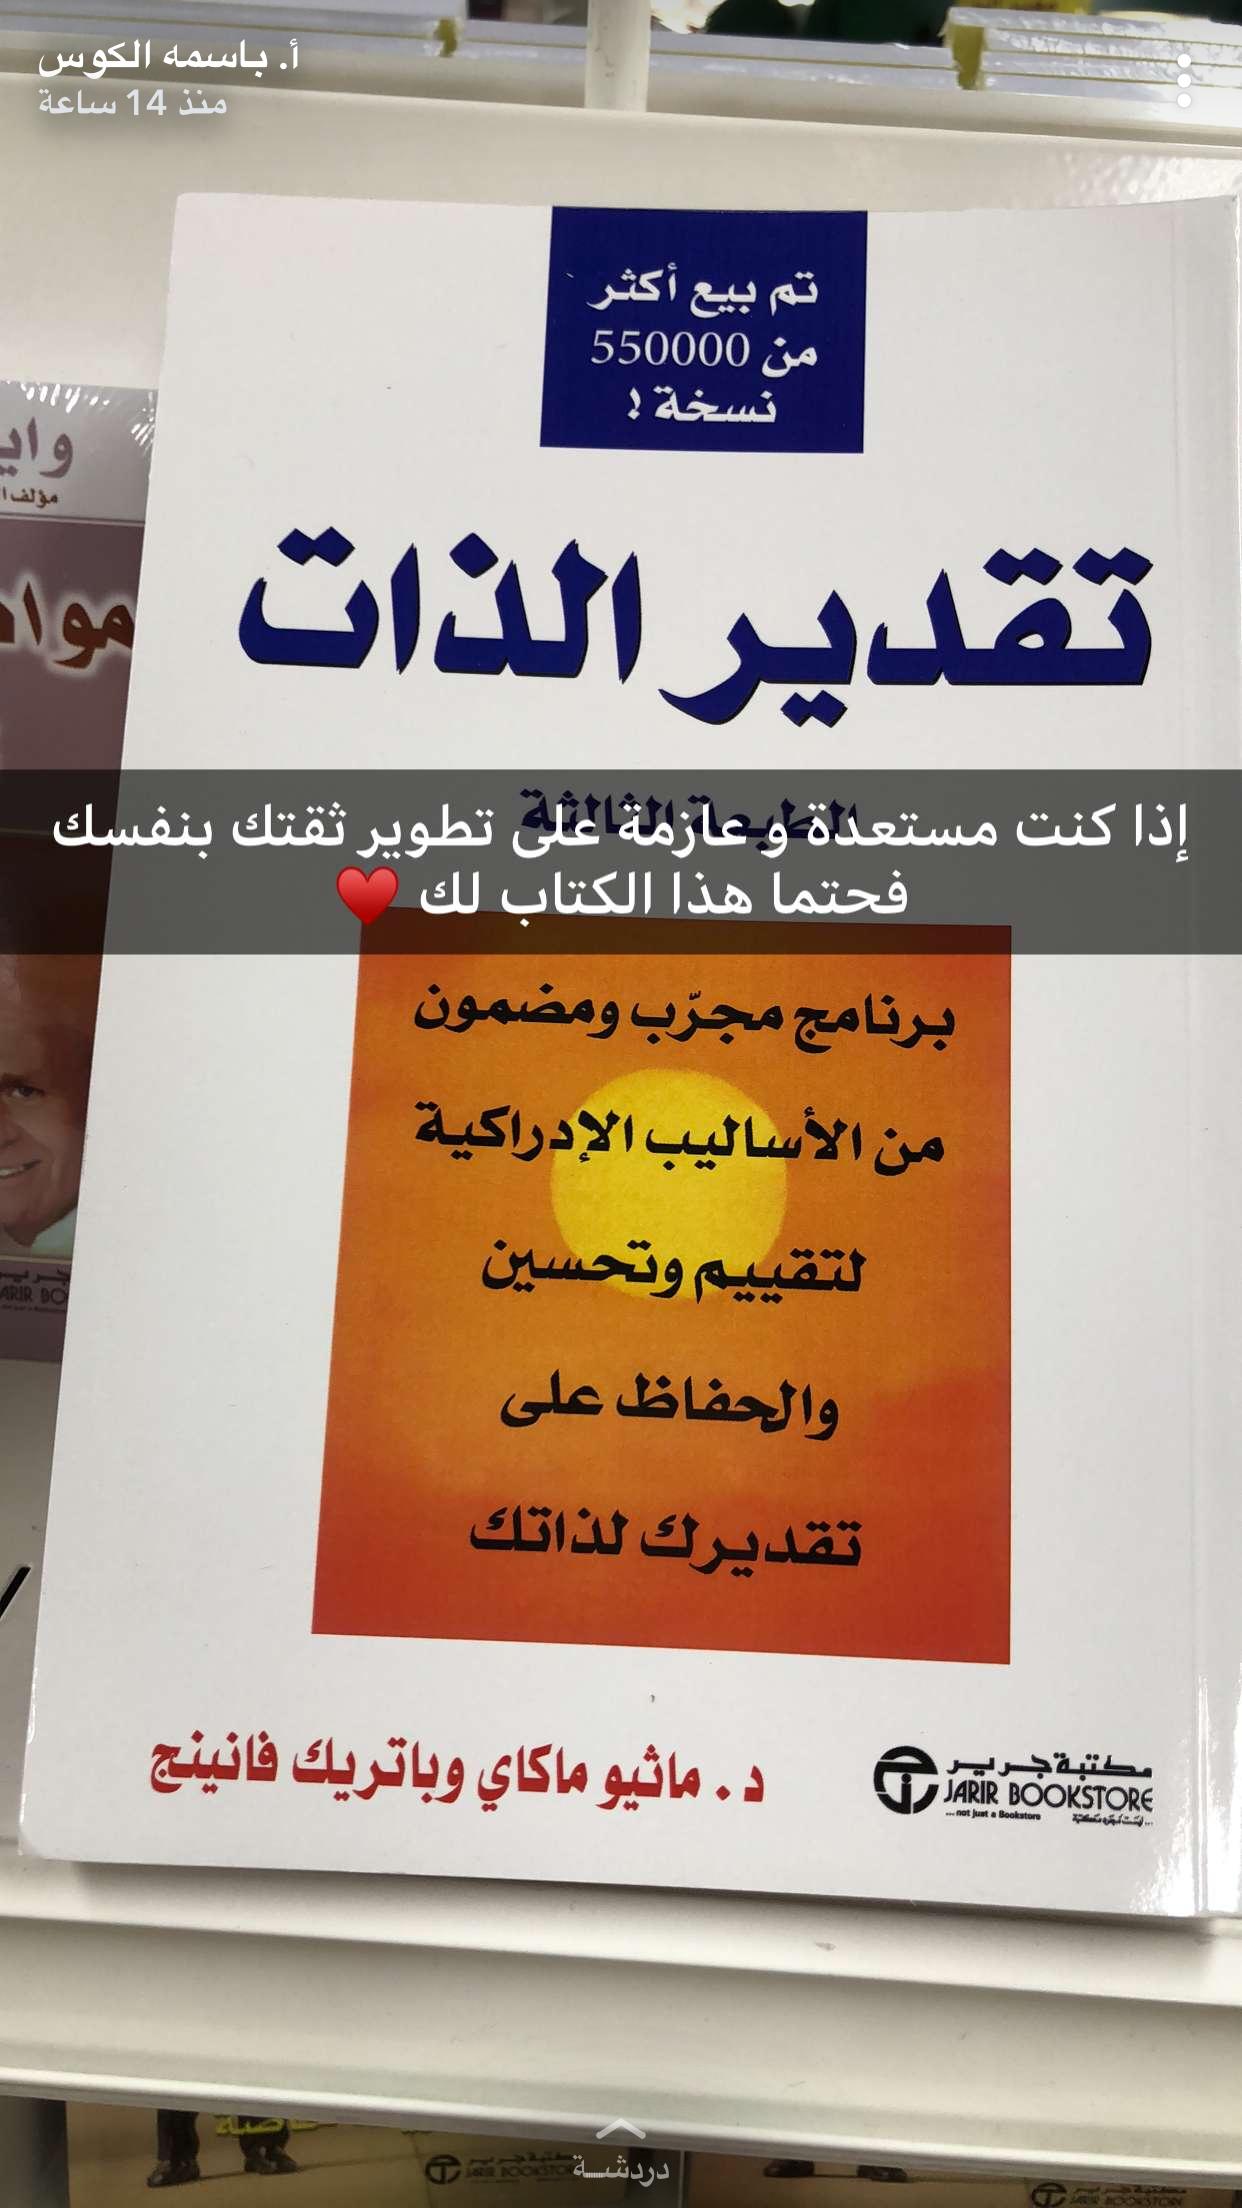 Pin By Otman Zemouri On كتب Philosophy Books Psychology Books Arabic Books